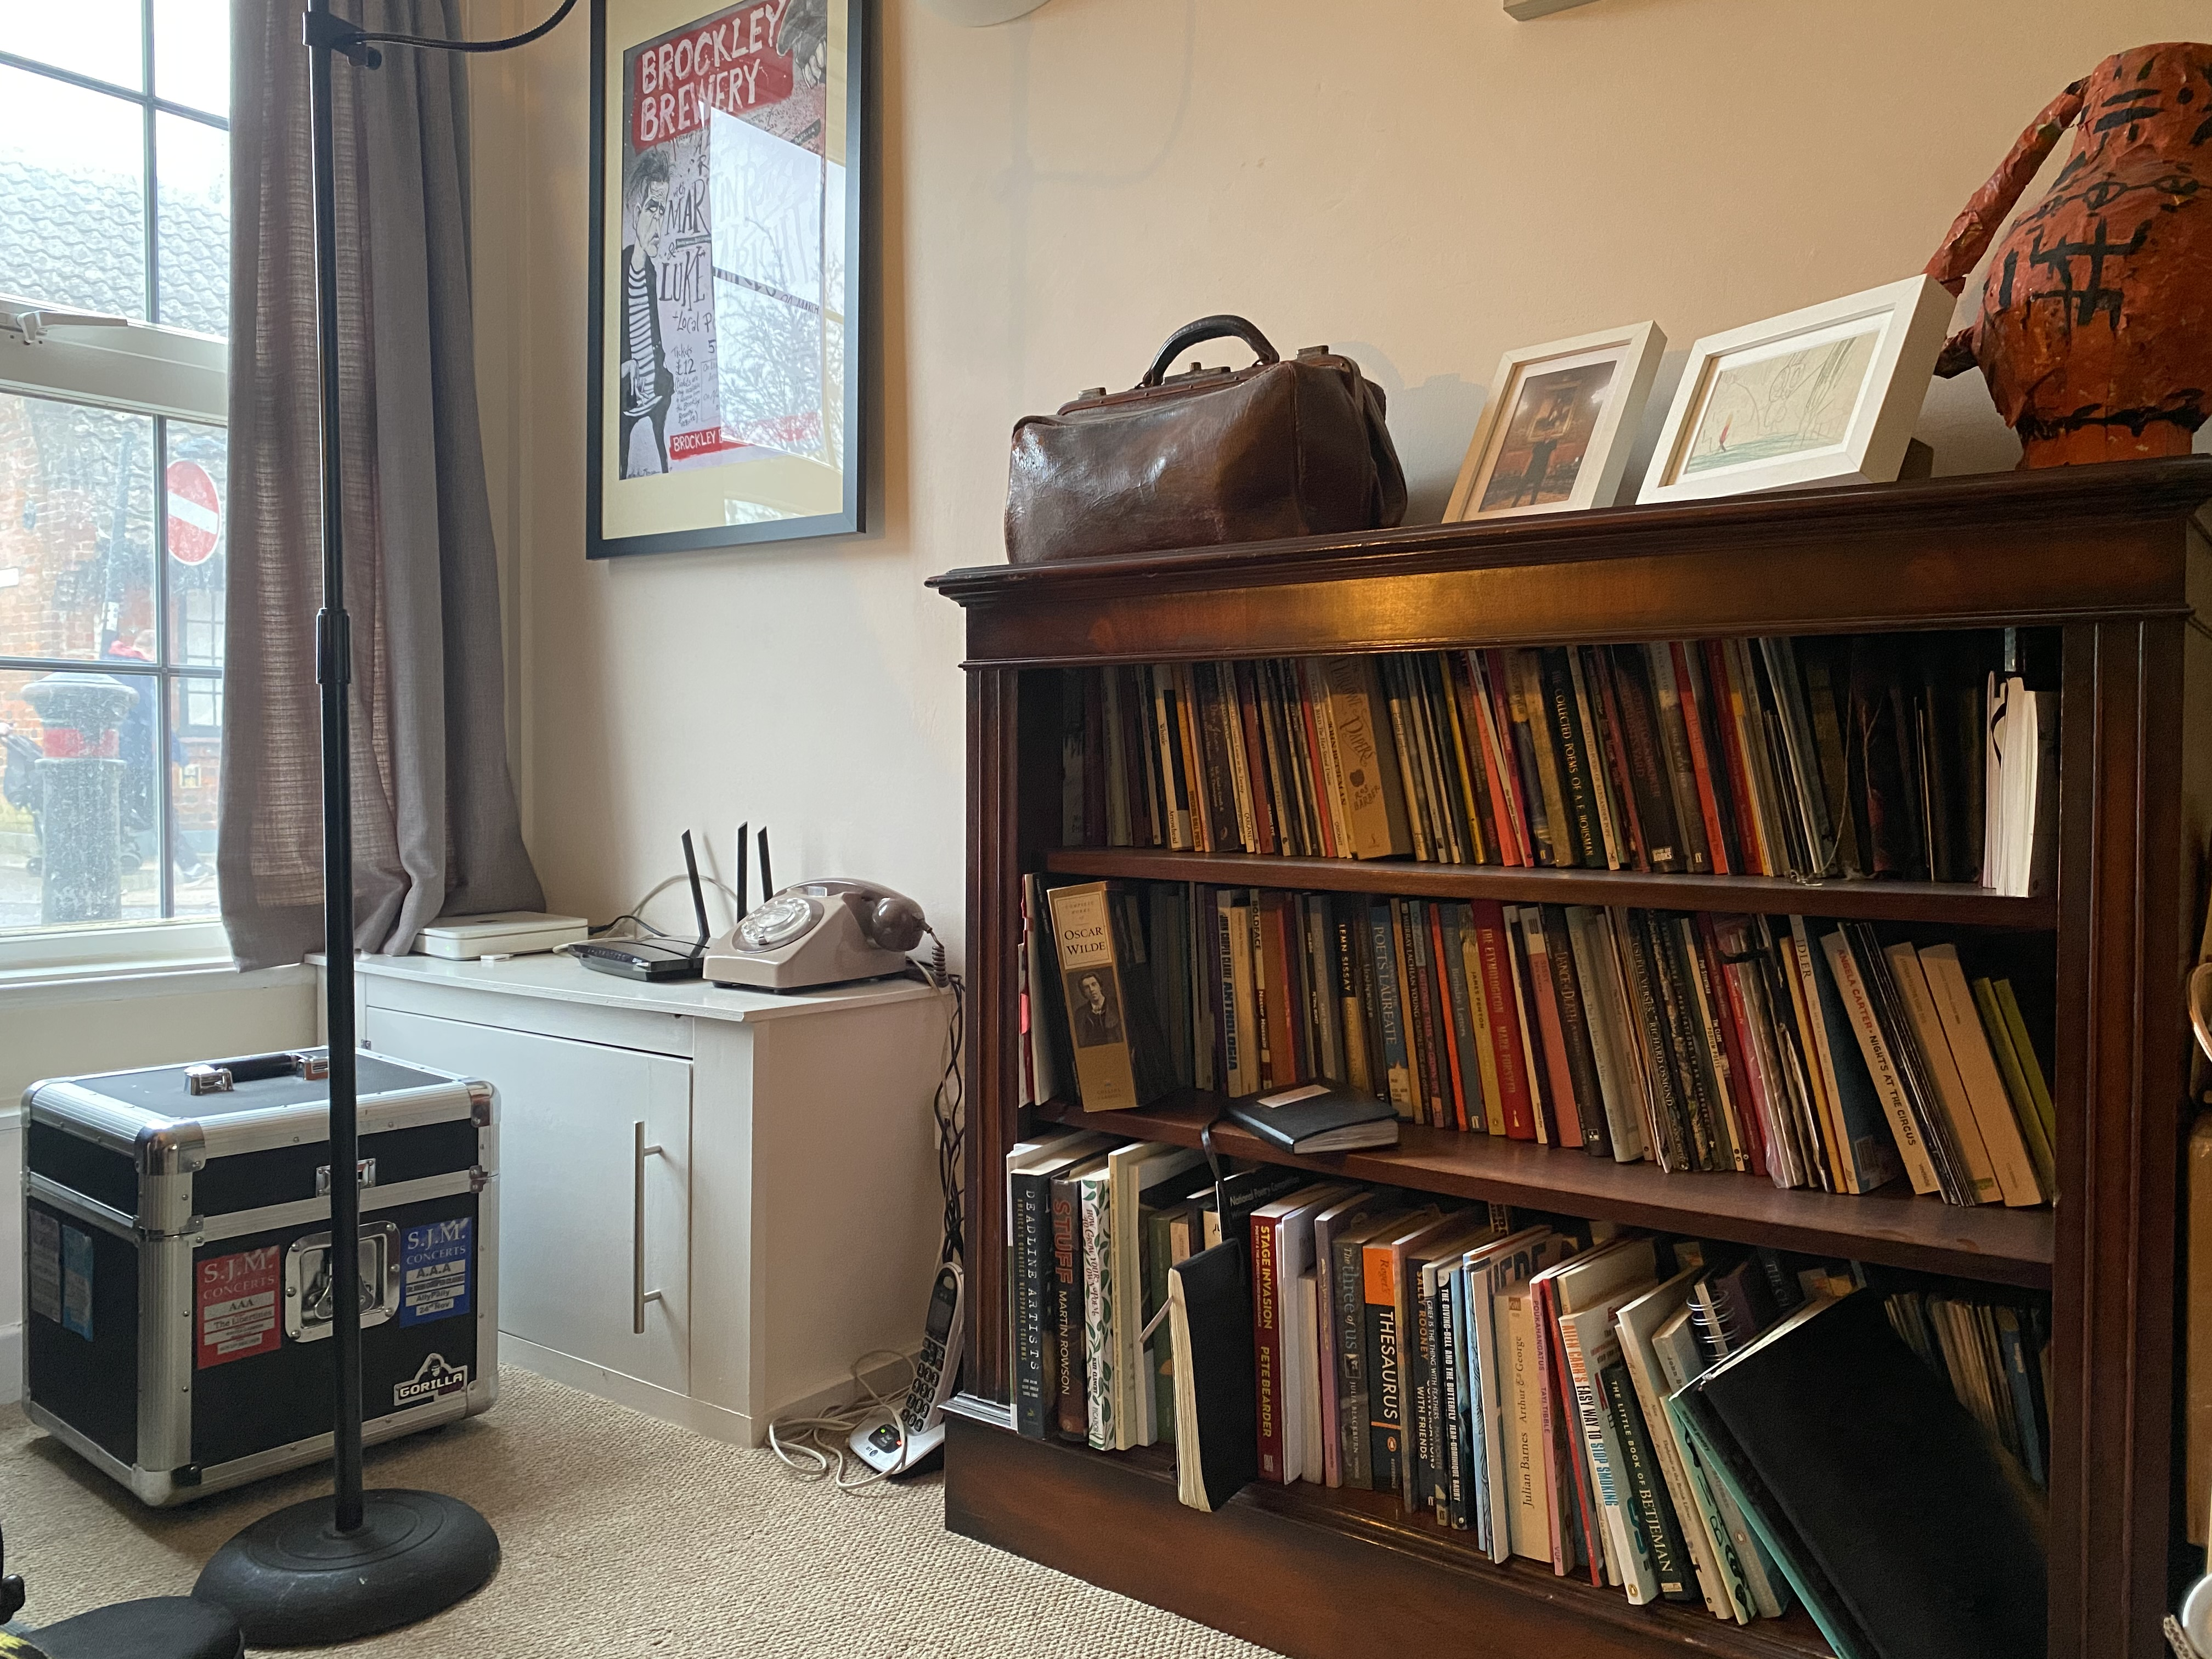 Photograph of bookshelf in Luke Wright's cottage